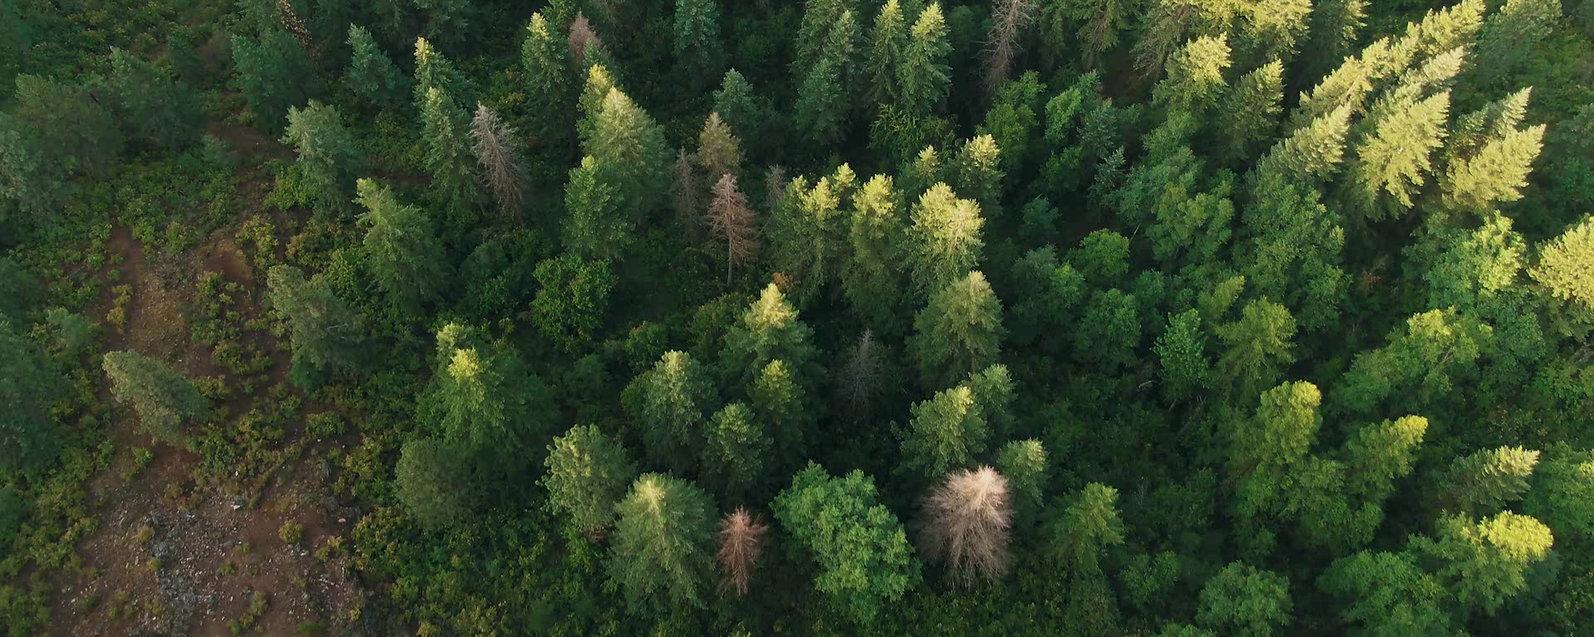 Bosque Sagrado